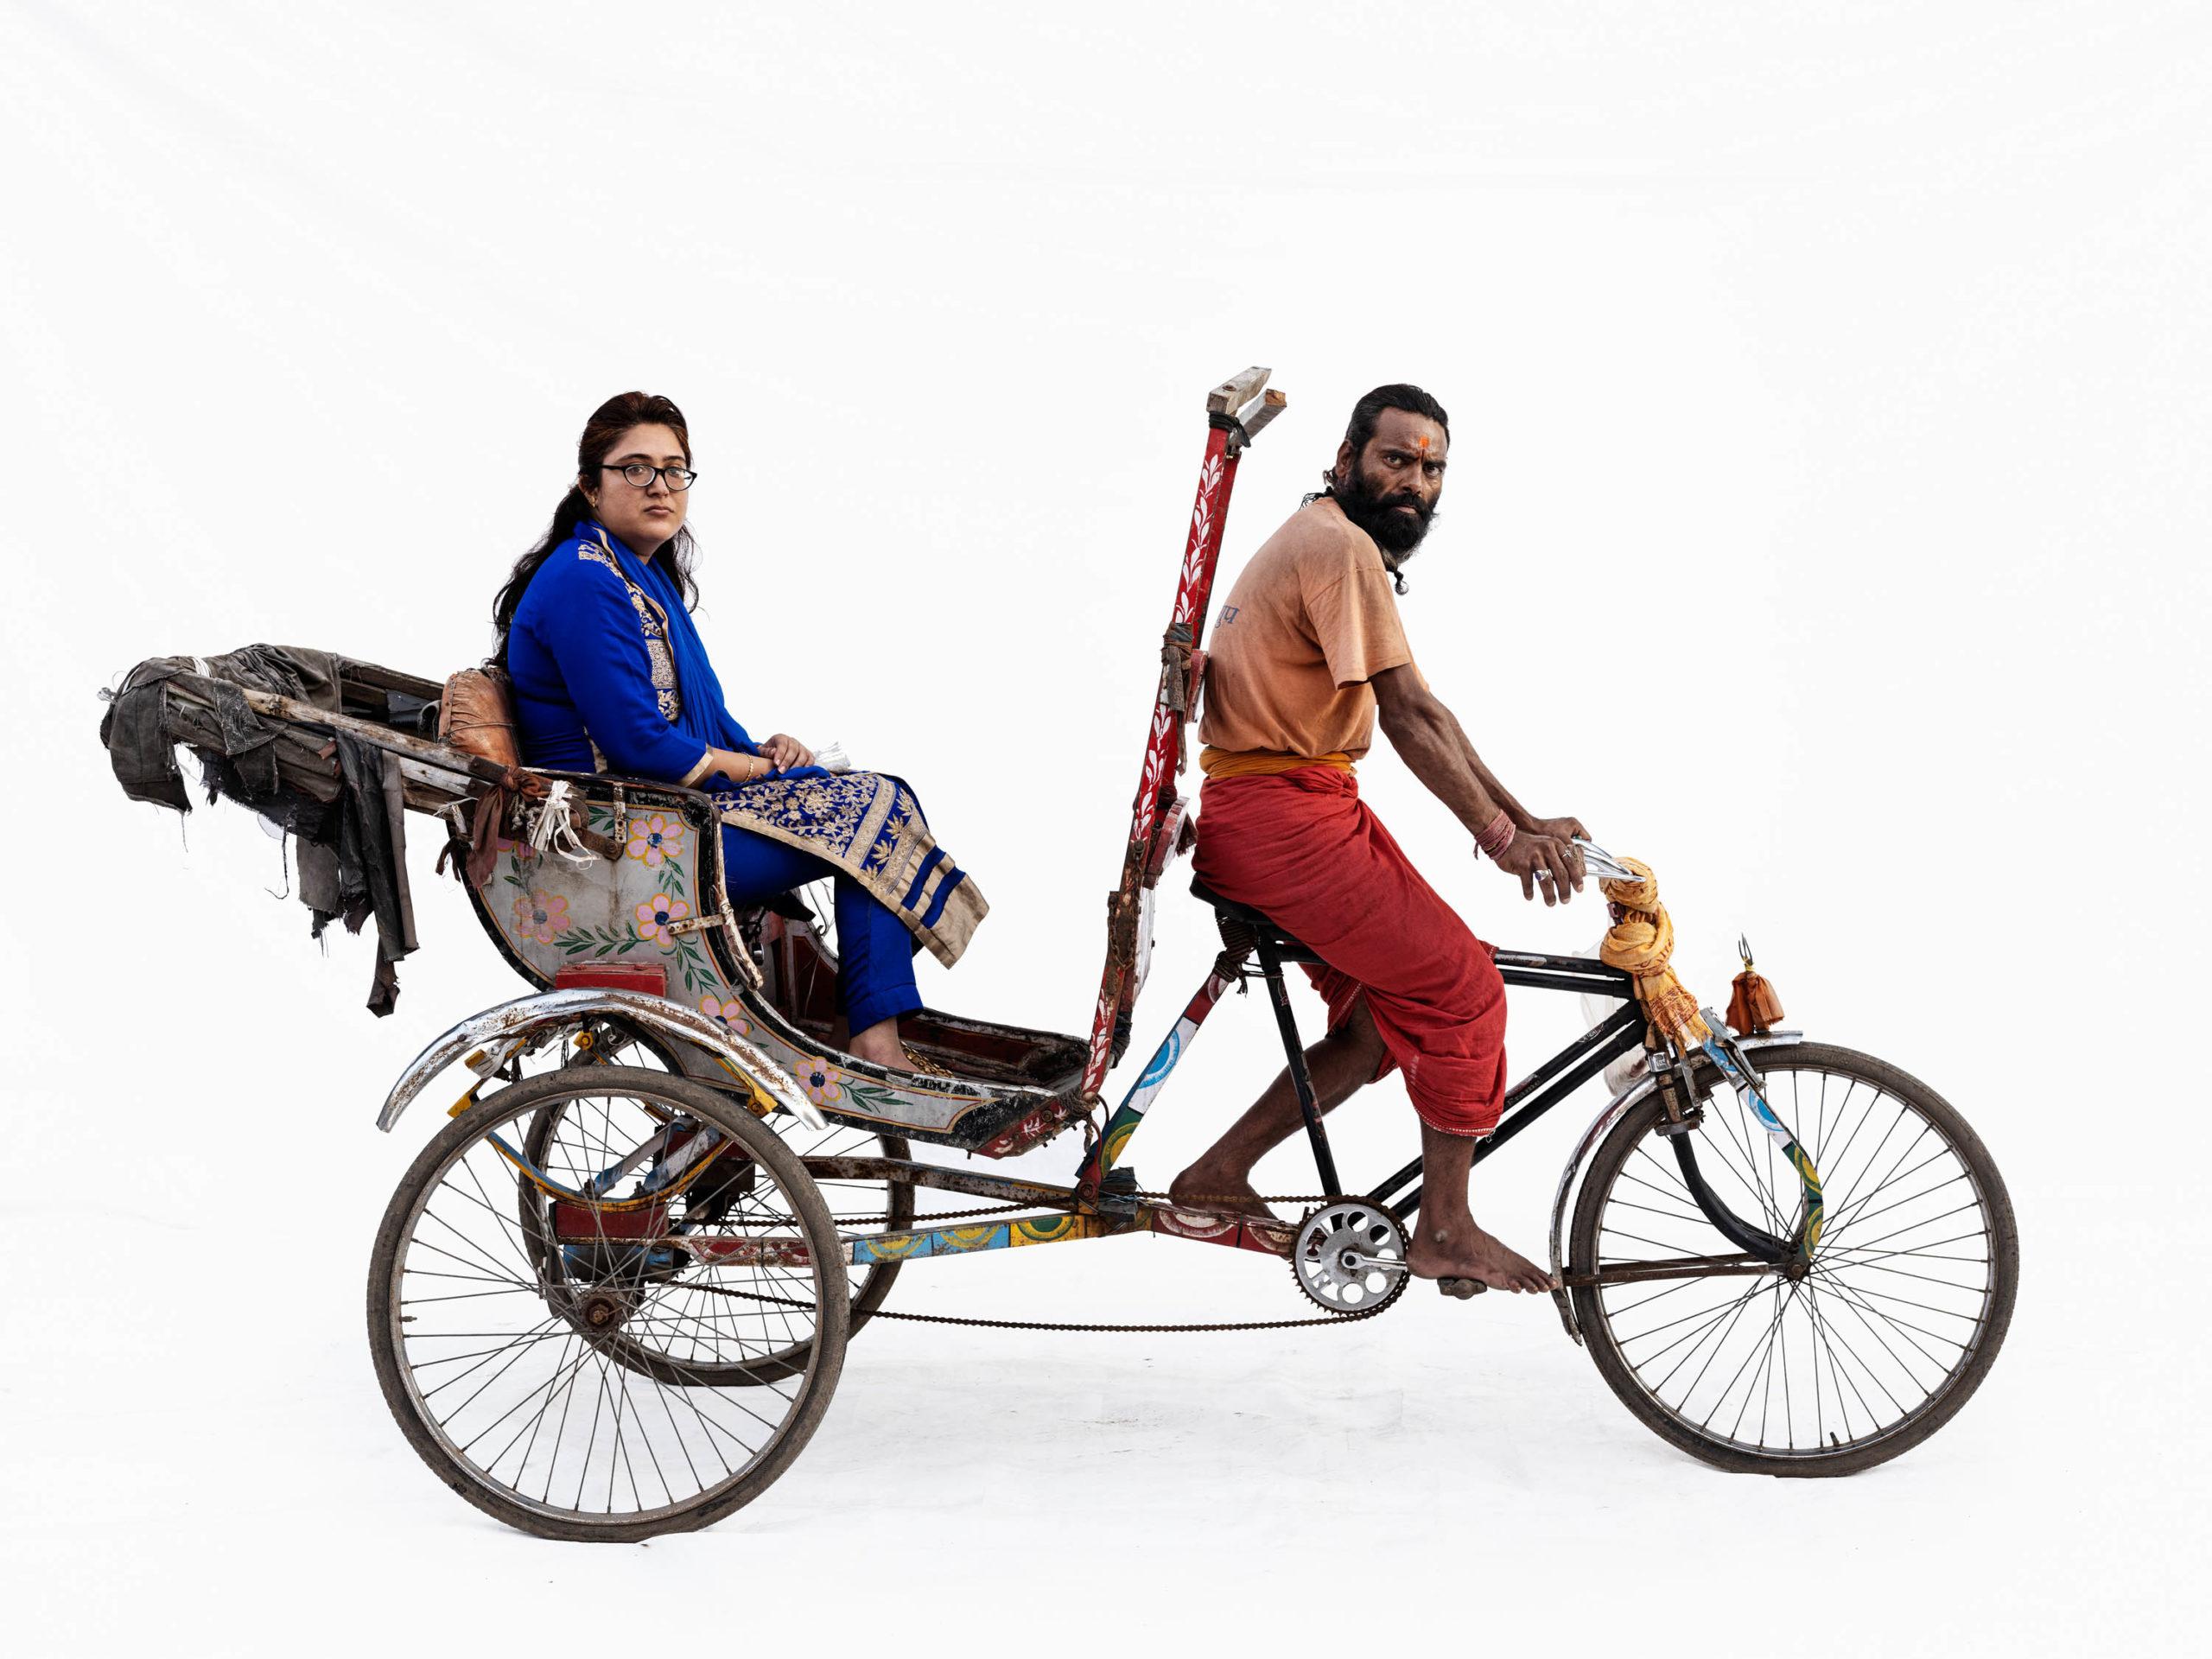 Cycle rickshaw; Mukesh Parmar (driver), Sonakshi Ramlani (Ujjain, Madhya Pradesh)